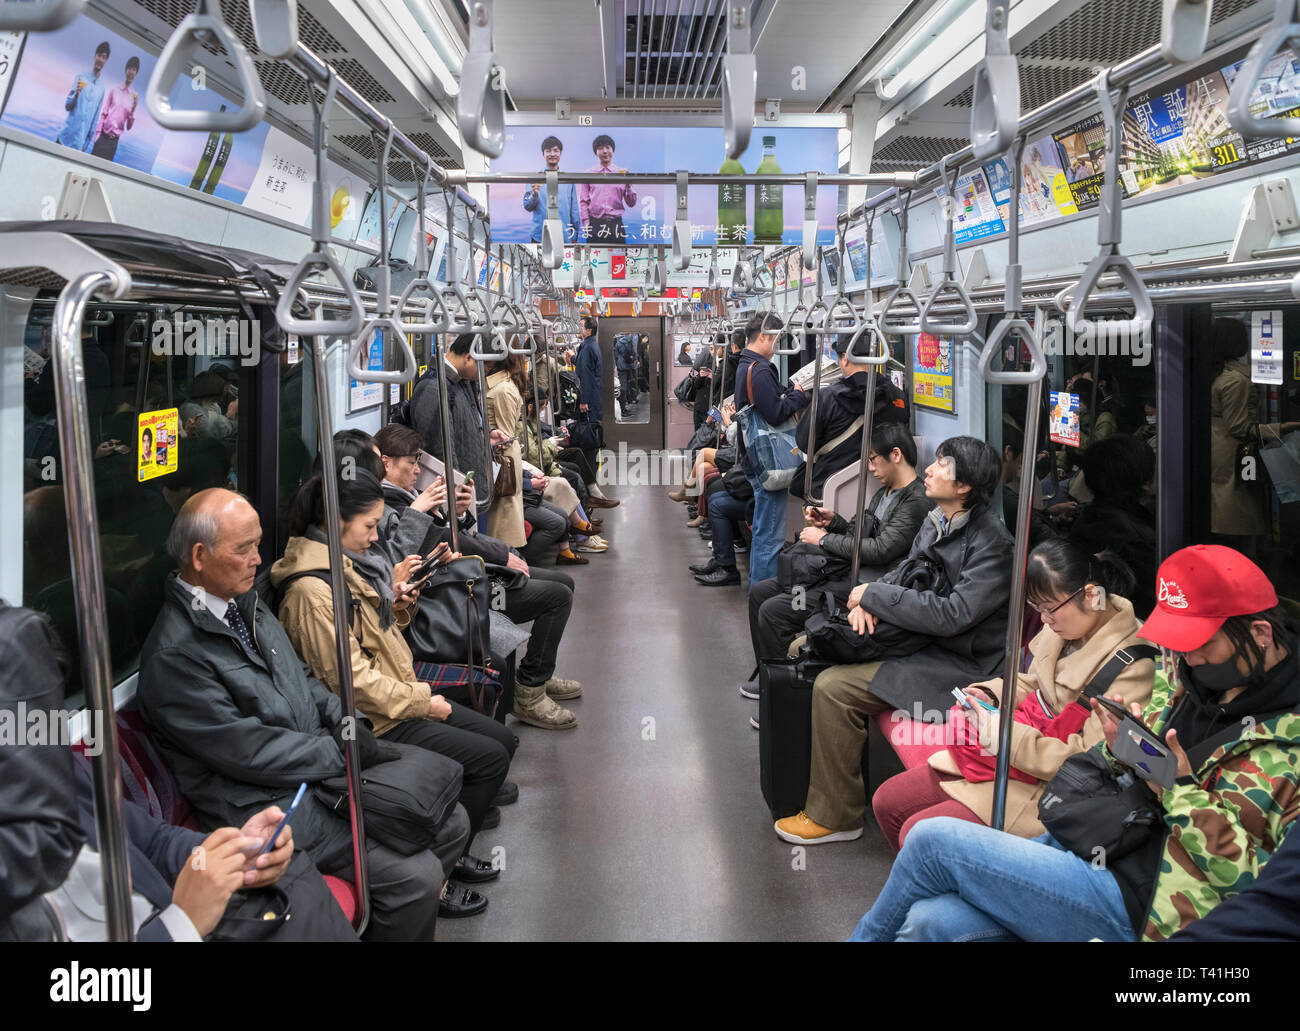 Tokyo subway. Carriage on the Tokyo Metro, Tokyo, Japan - Stock Image